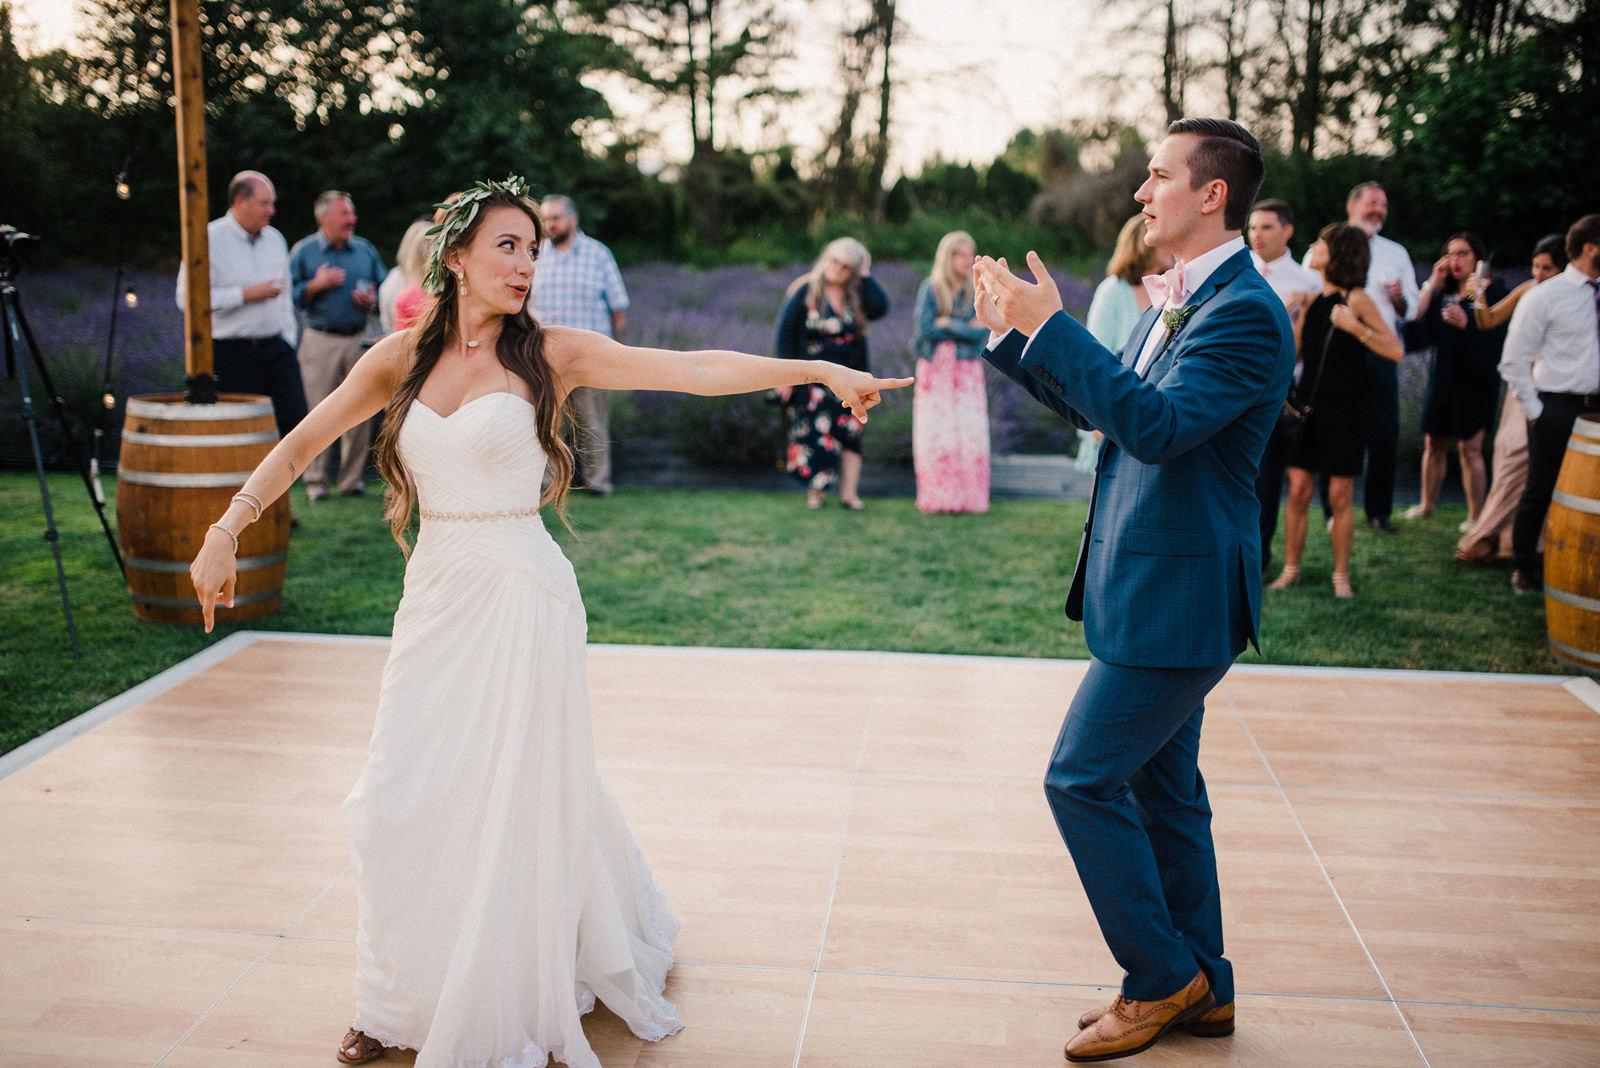 090-woodinville-lavendar-farm-wedding-with-golden-glowy-photos.jpg